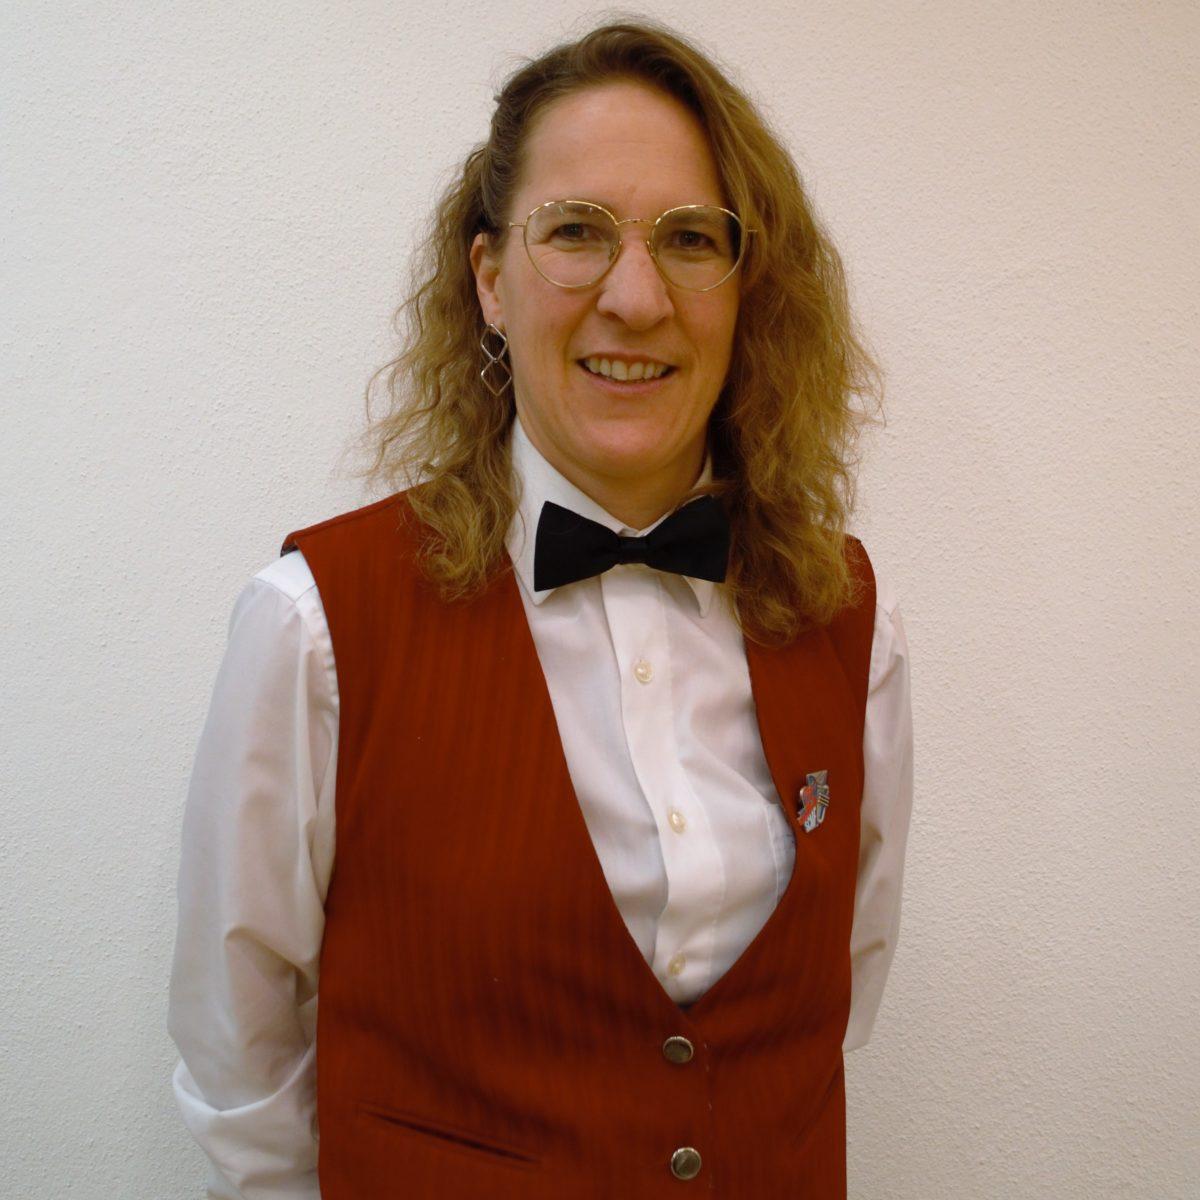 Chantal Regamey